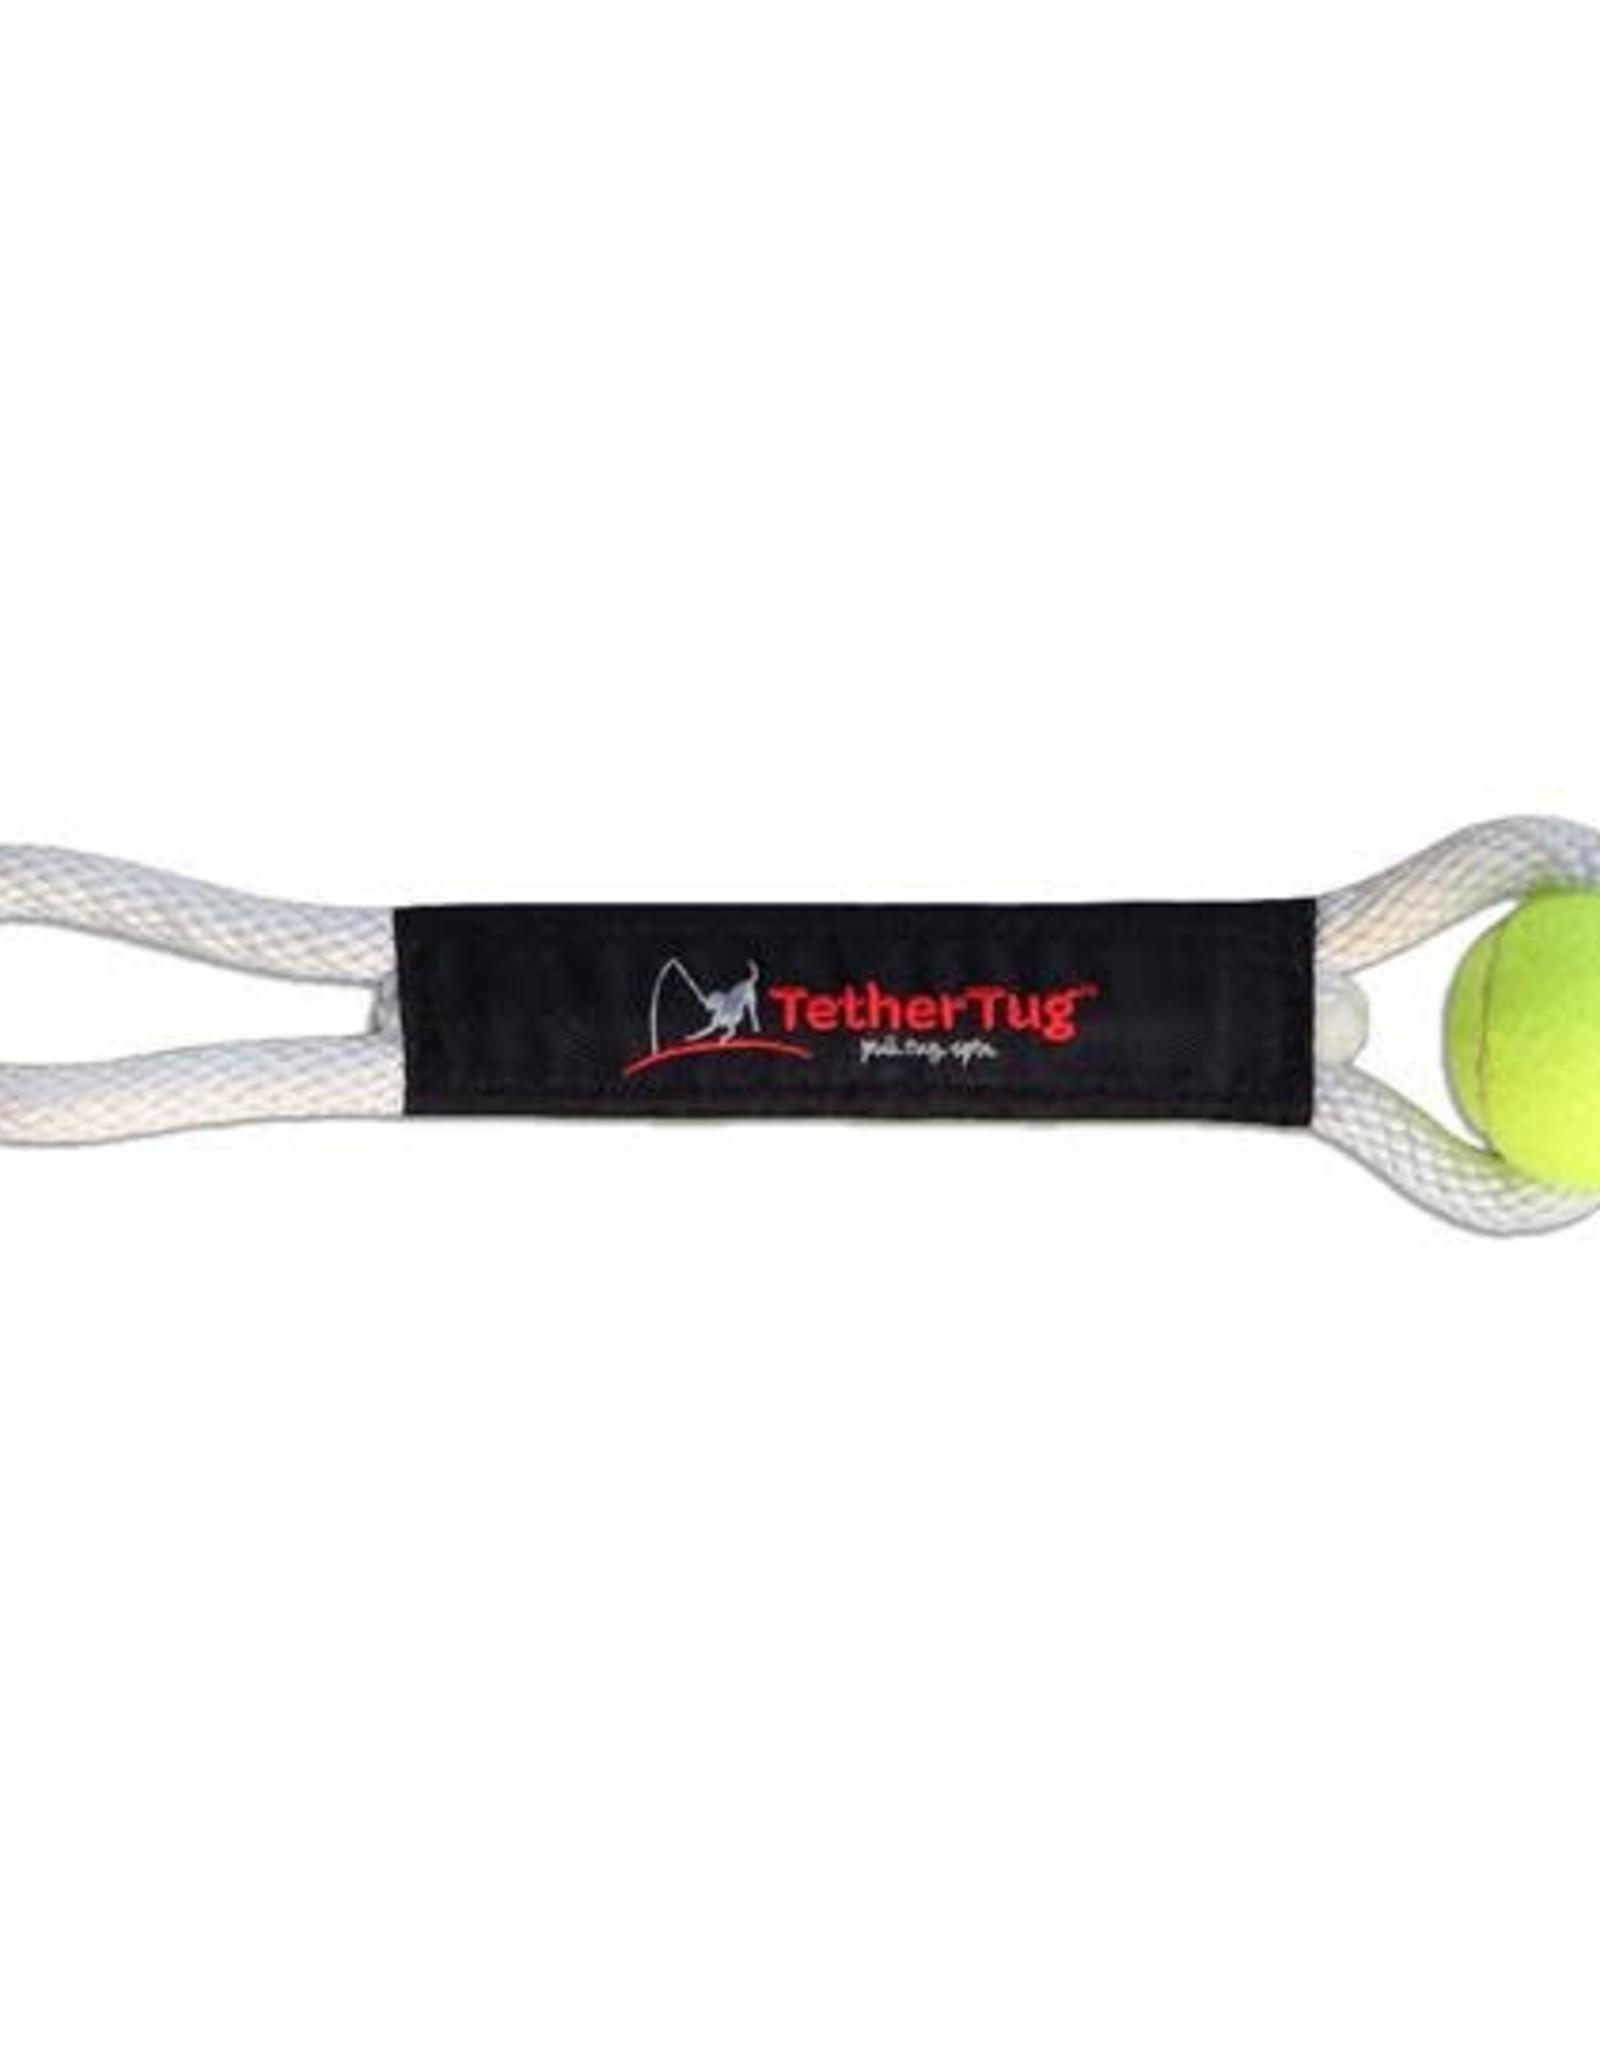 Tether Tug Ball Toy Plus - Tether Tug